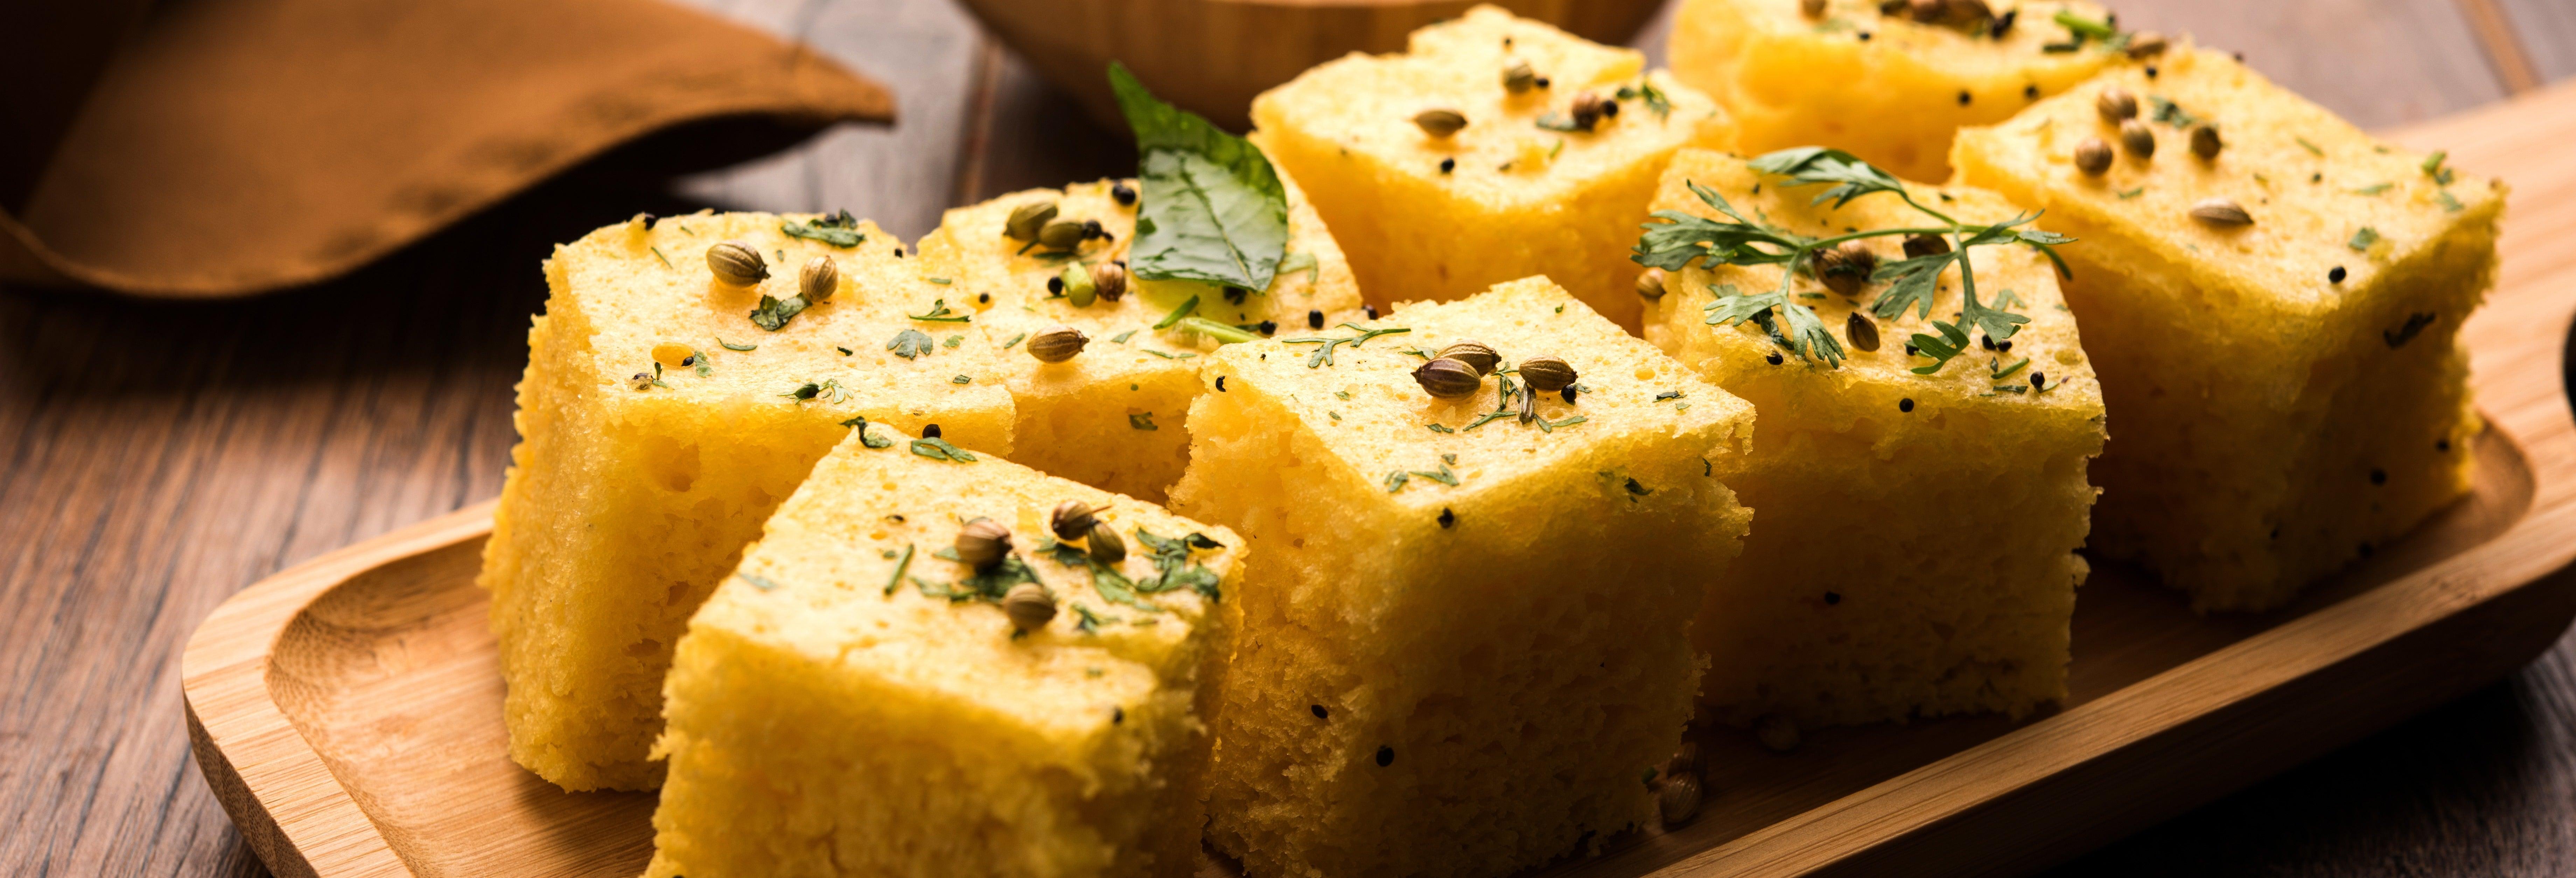 Tour gastronômico por Udaipur